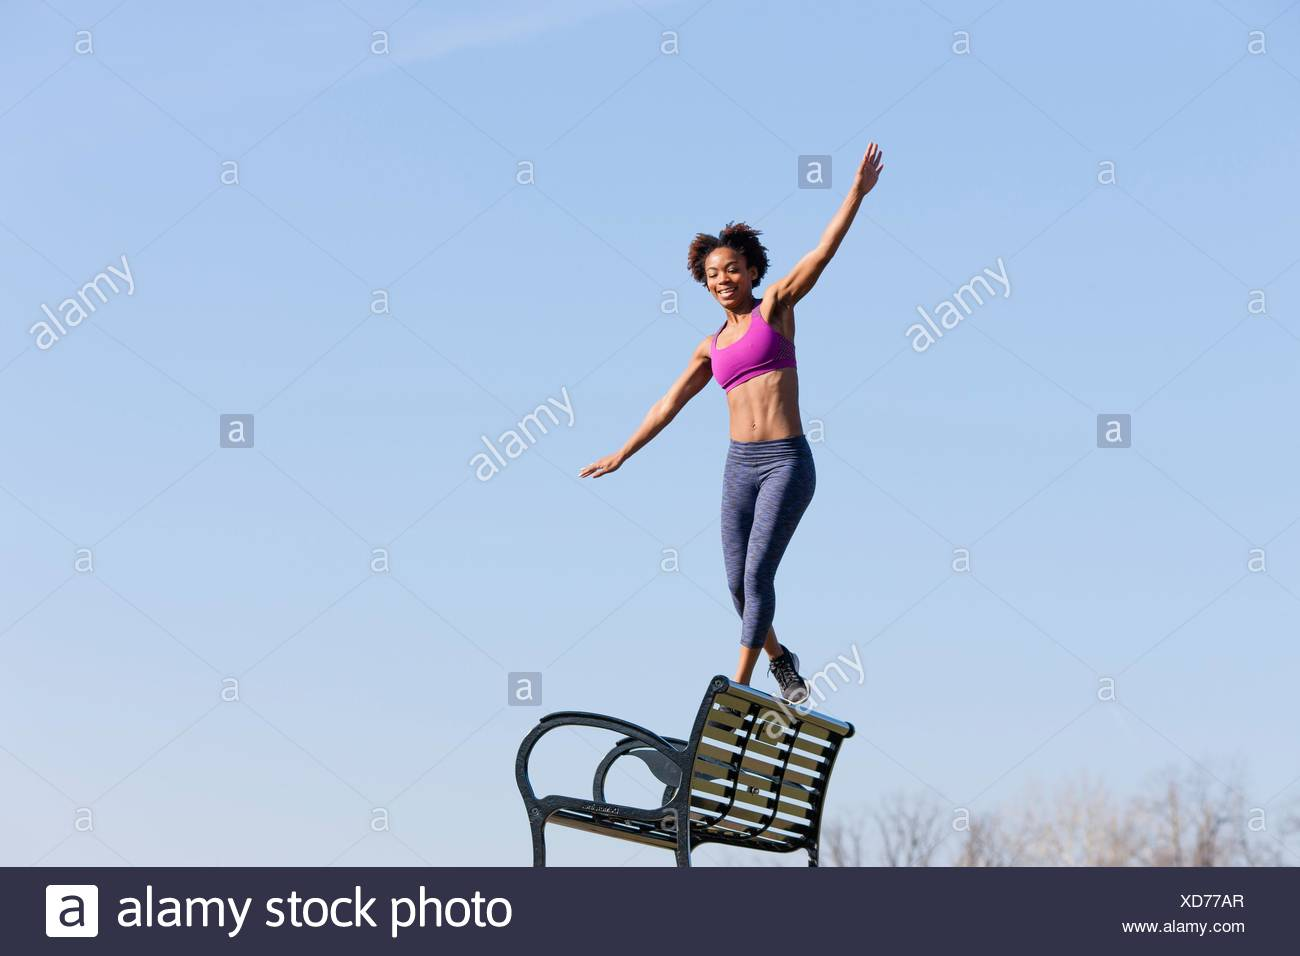 Young woman walking along edge of bench - Stock Image